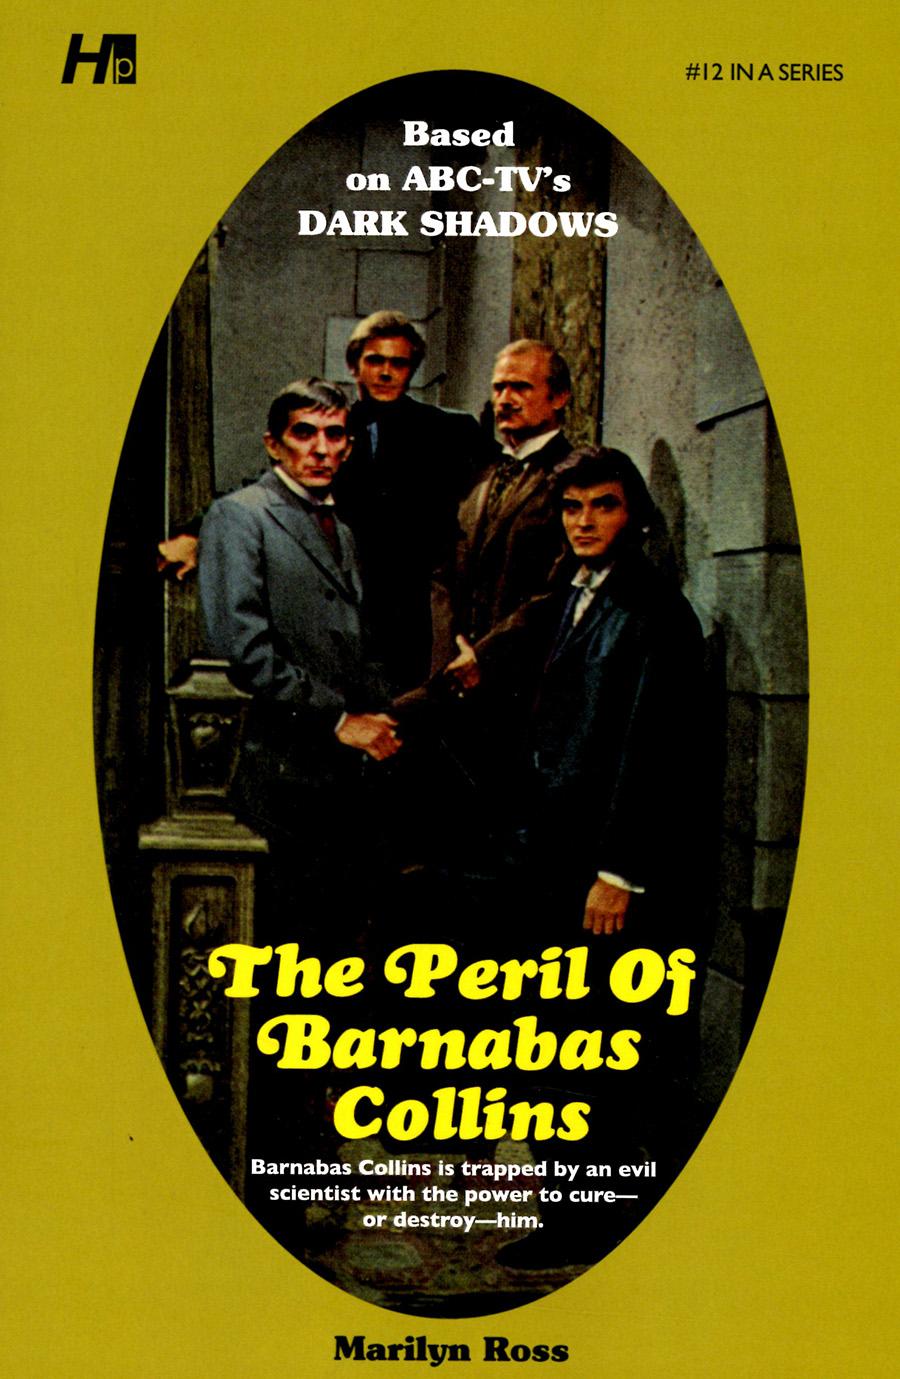 Dark Shadows Paperback Library Novel Vol 12 Peril Of Barnabas Collins TP